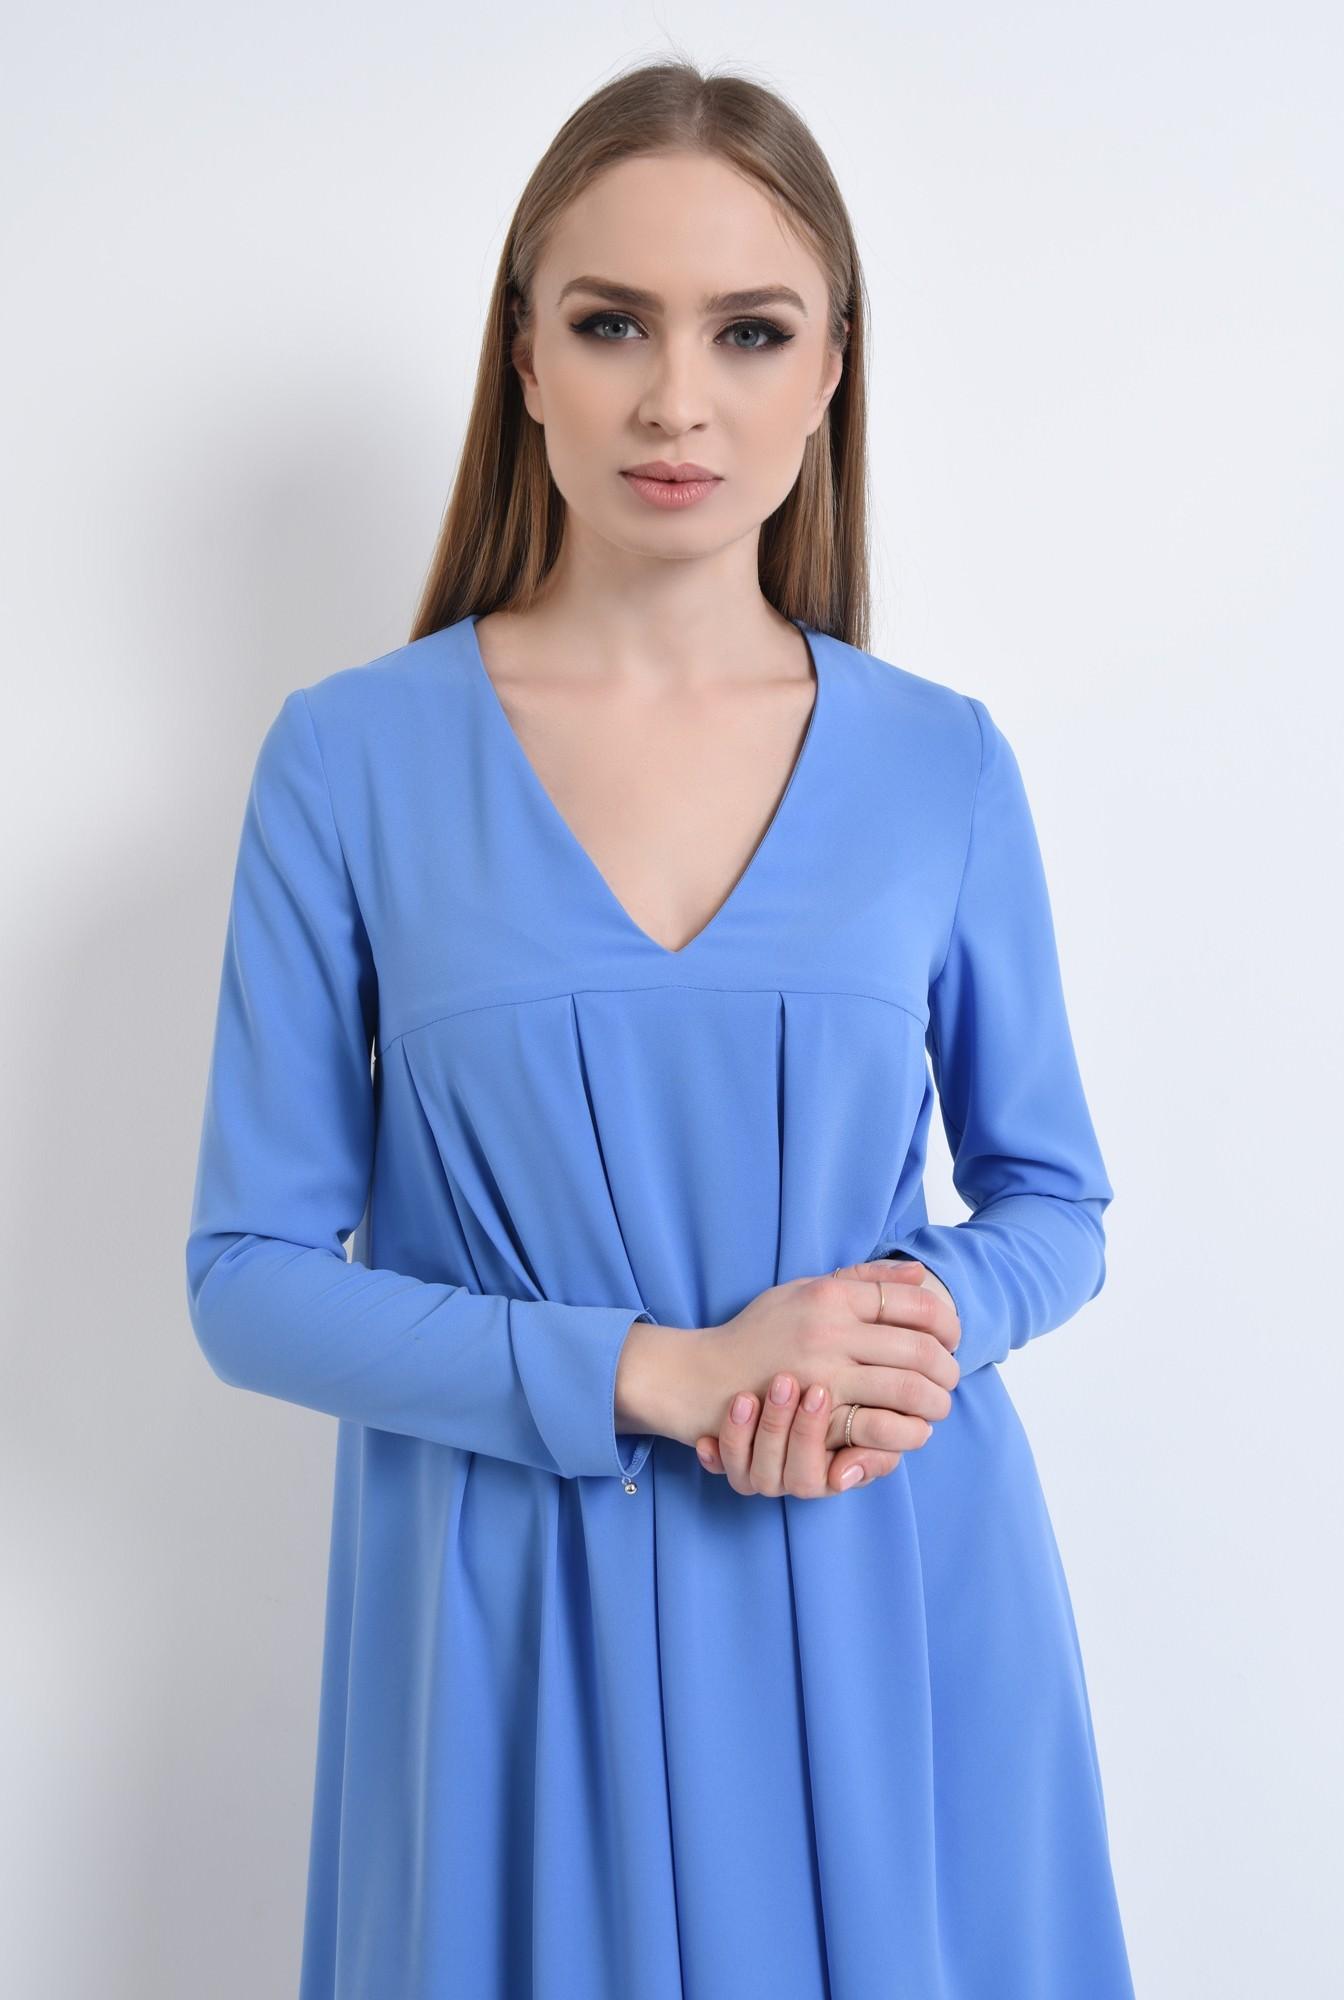 2 - Rochie casual, bleu